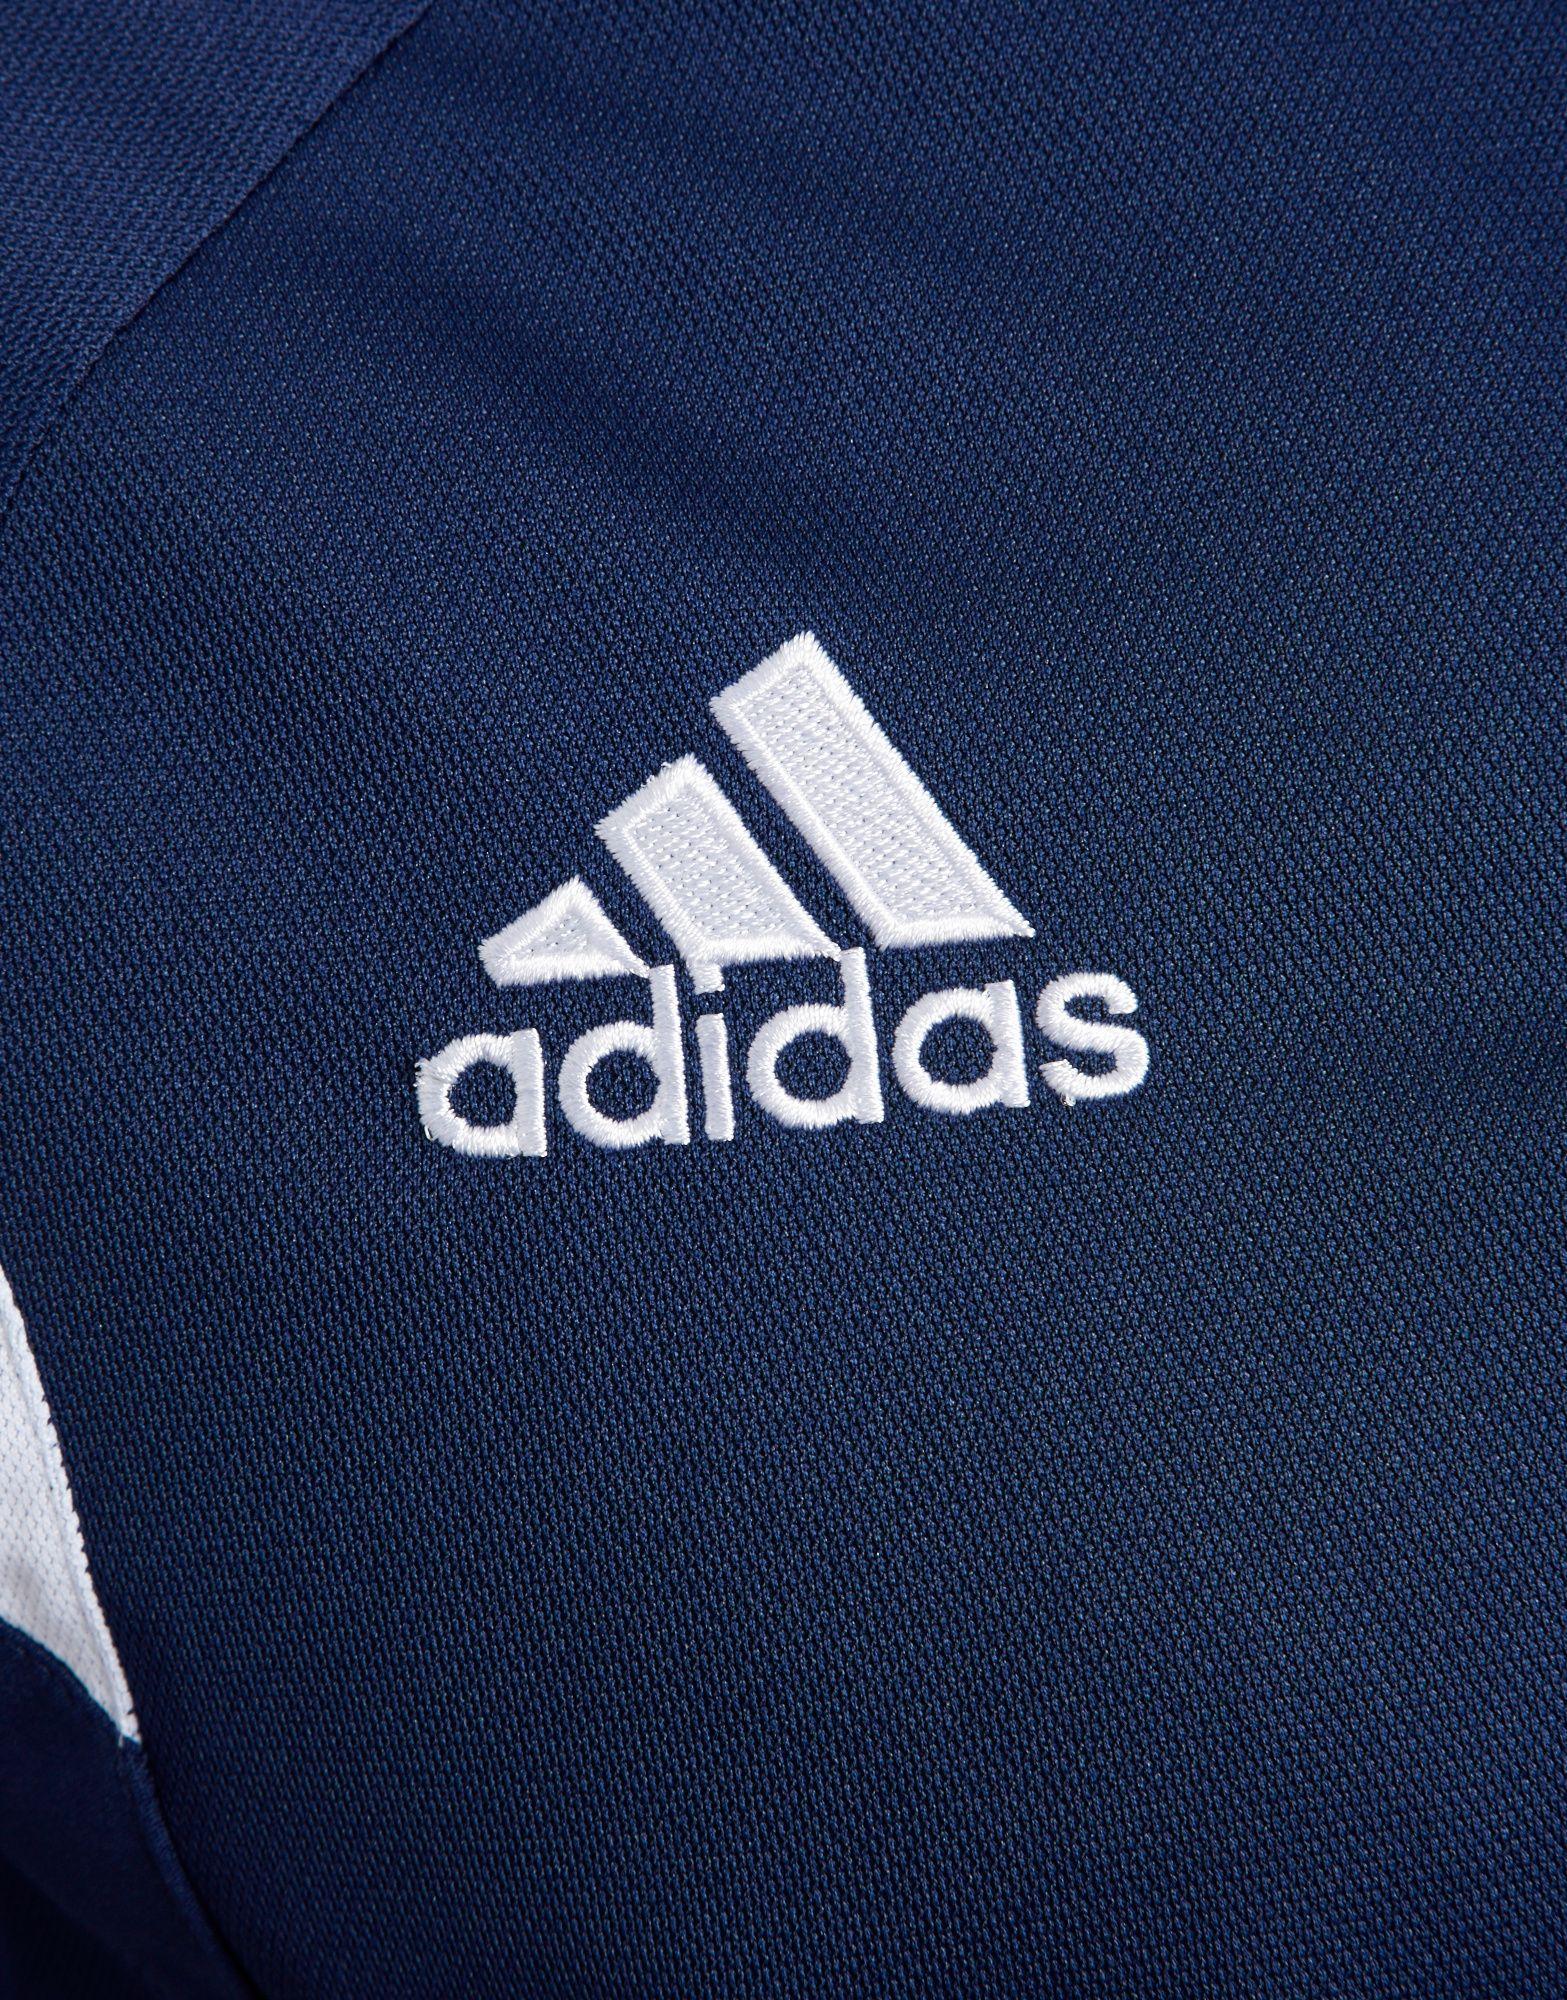 adidas Northern Ireland 2014 Training Polo Shirt